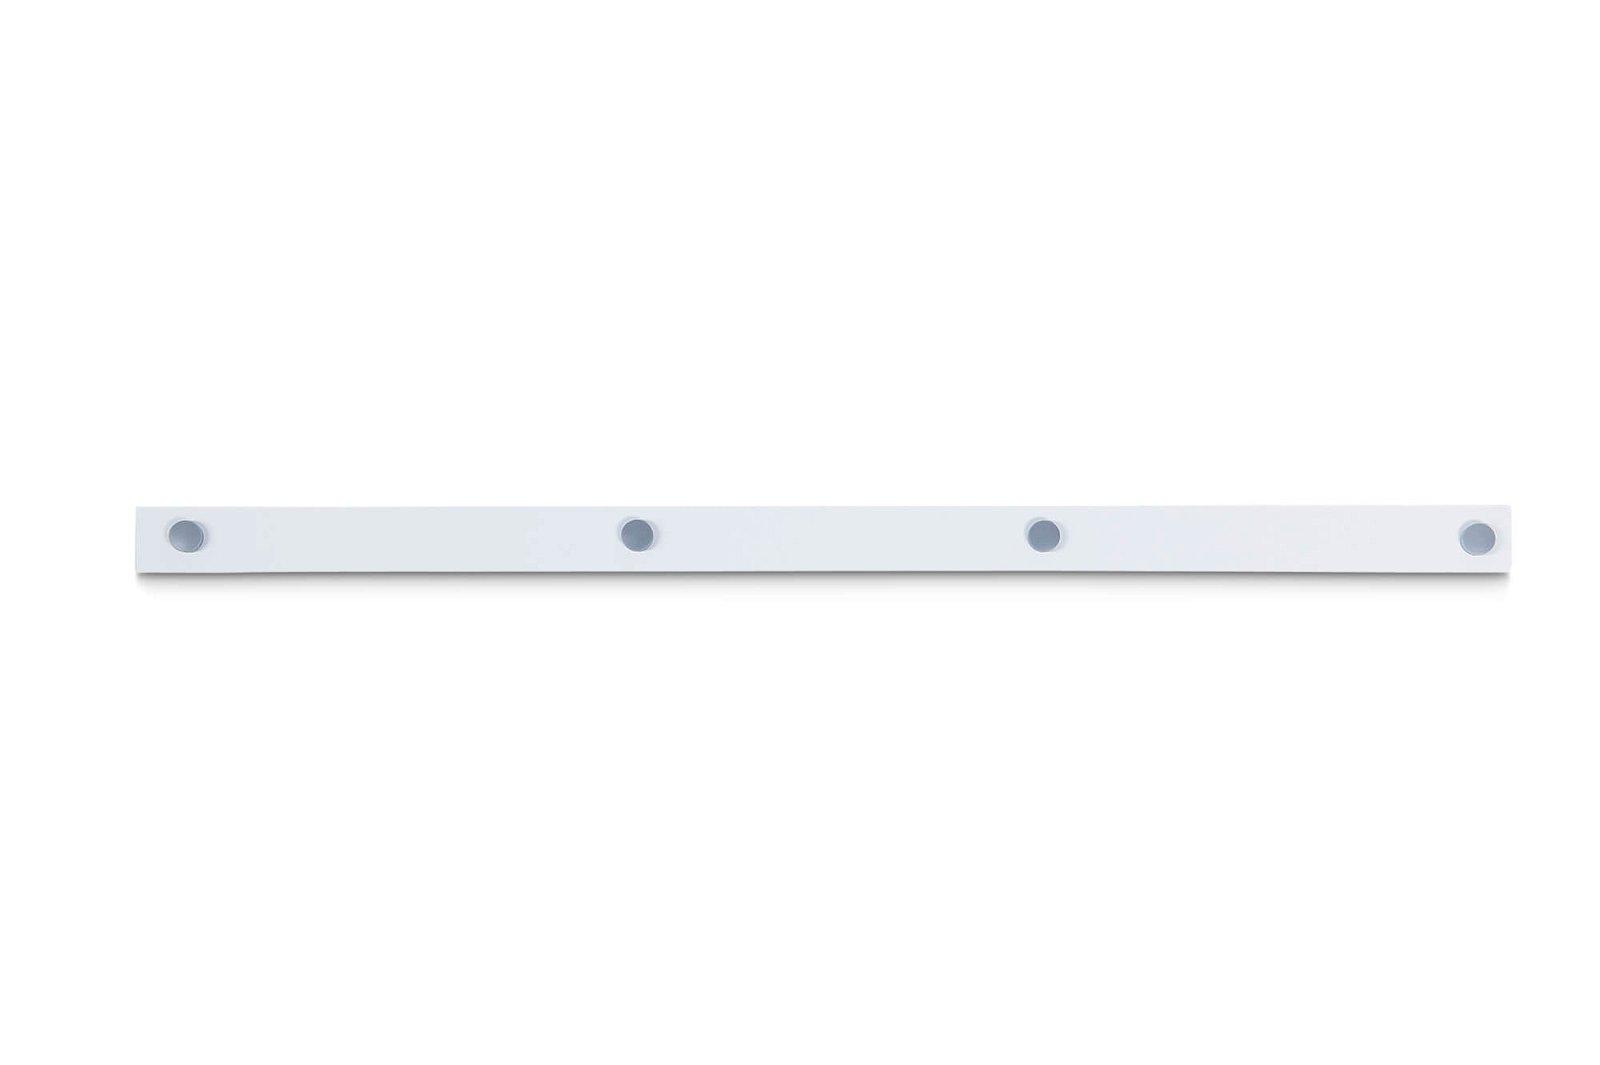 Ferroleiste MAULstandard, Länge 100 cm, inkl. 4 Magnete, weiß